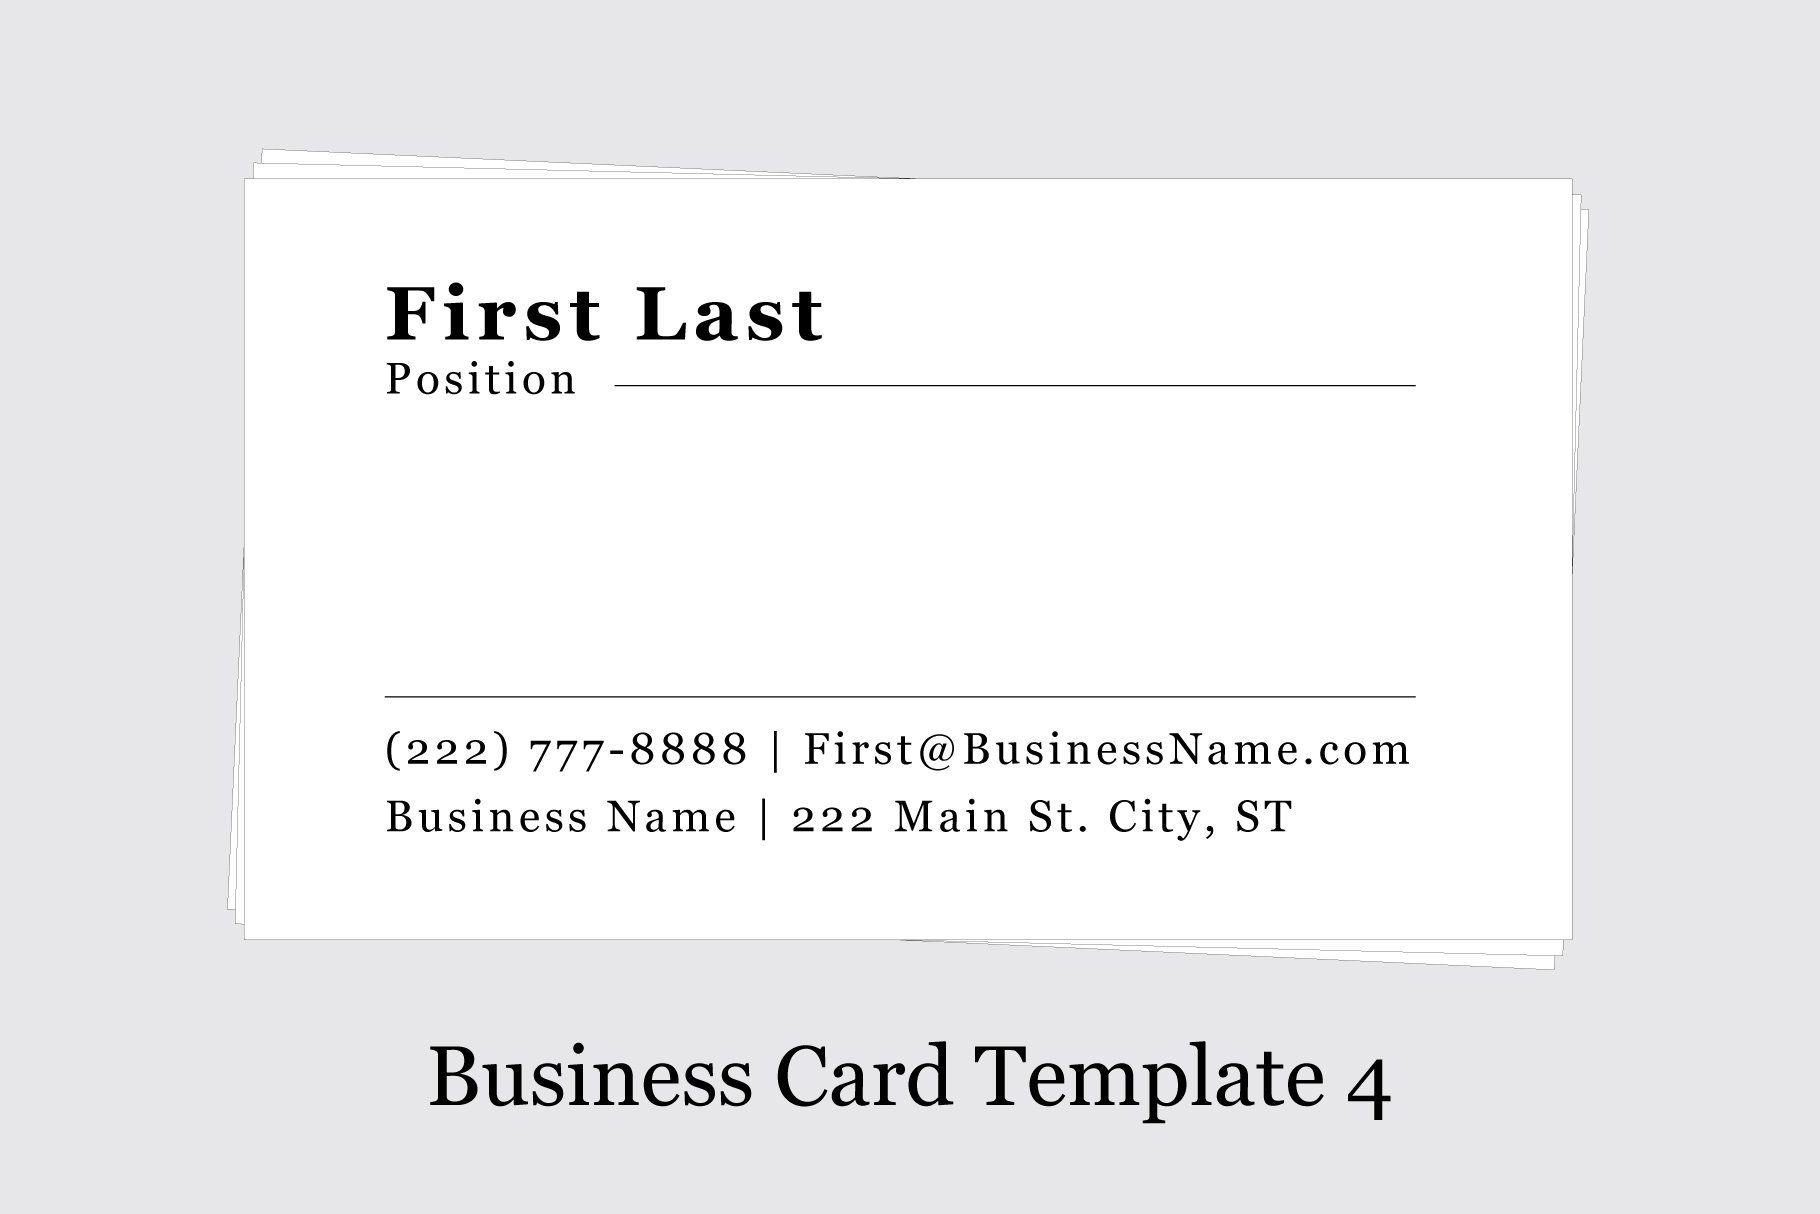 Business Card Template 4 Business Card Template Card Template Cool Business Cards